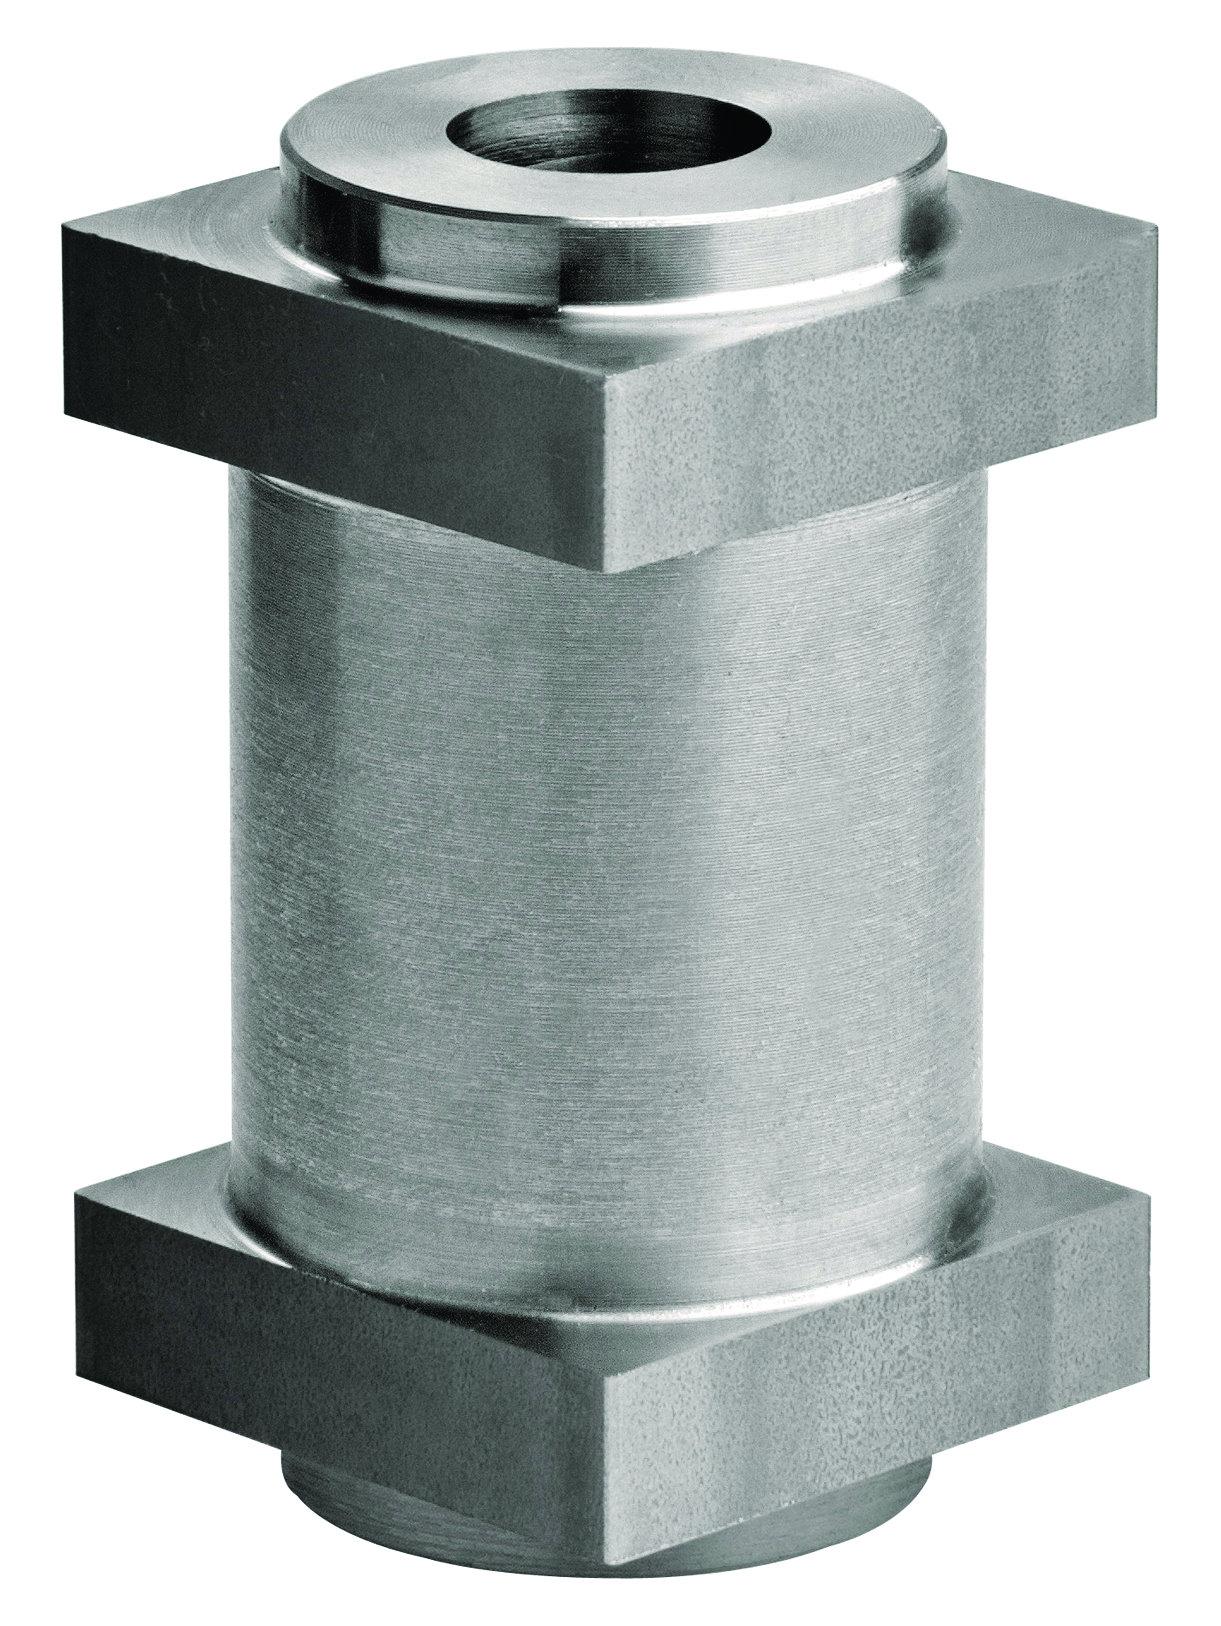 Holed Pivot w/Square Base for Clamp Hinge item 180-M18